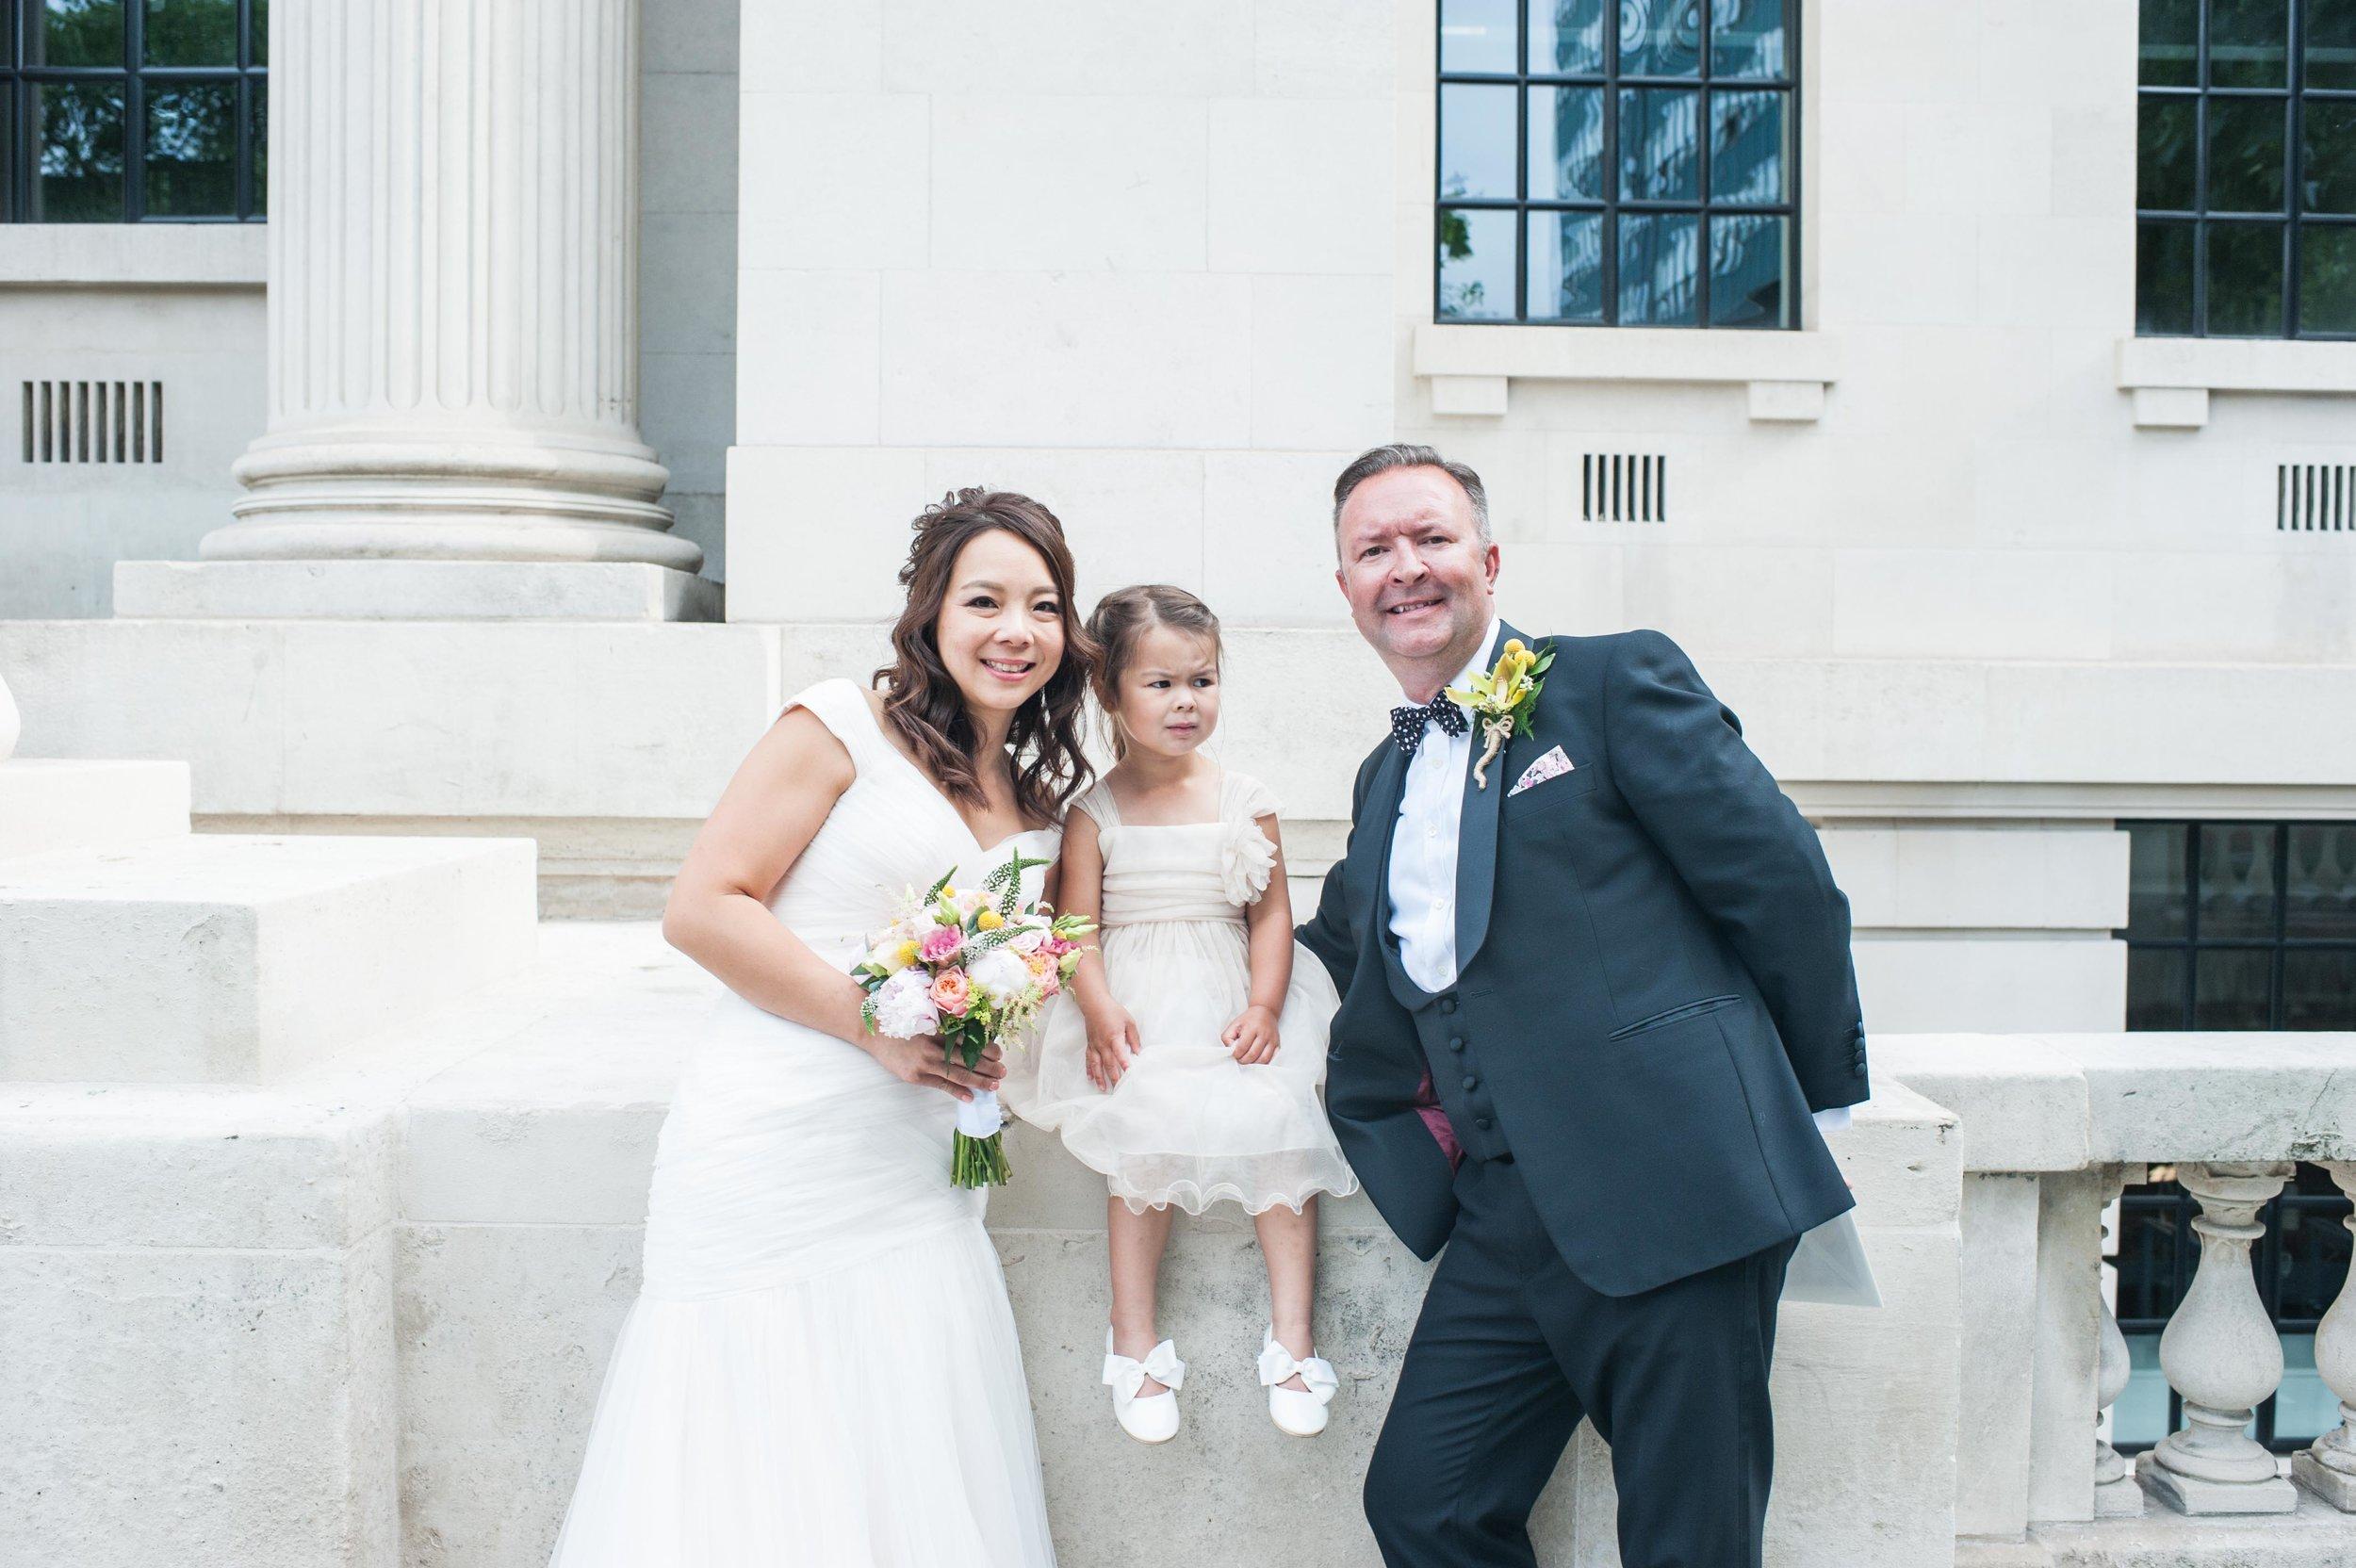 D&M_Marylebone Town Hall Wedding (156 of 239).jpg